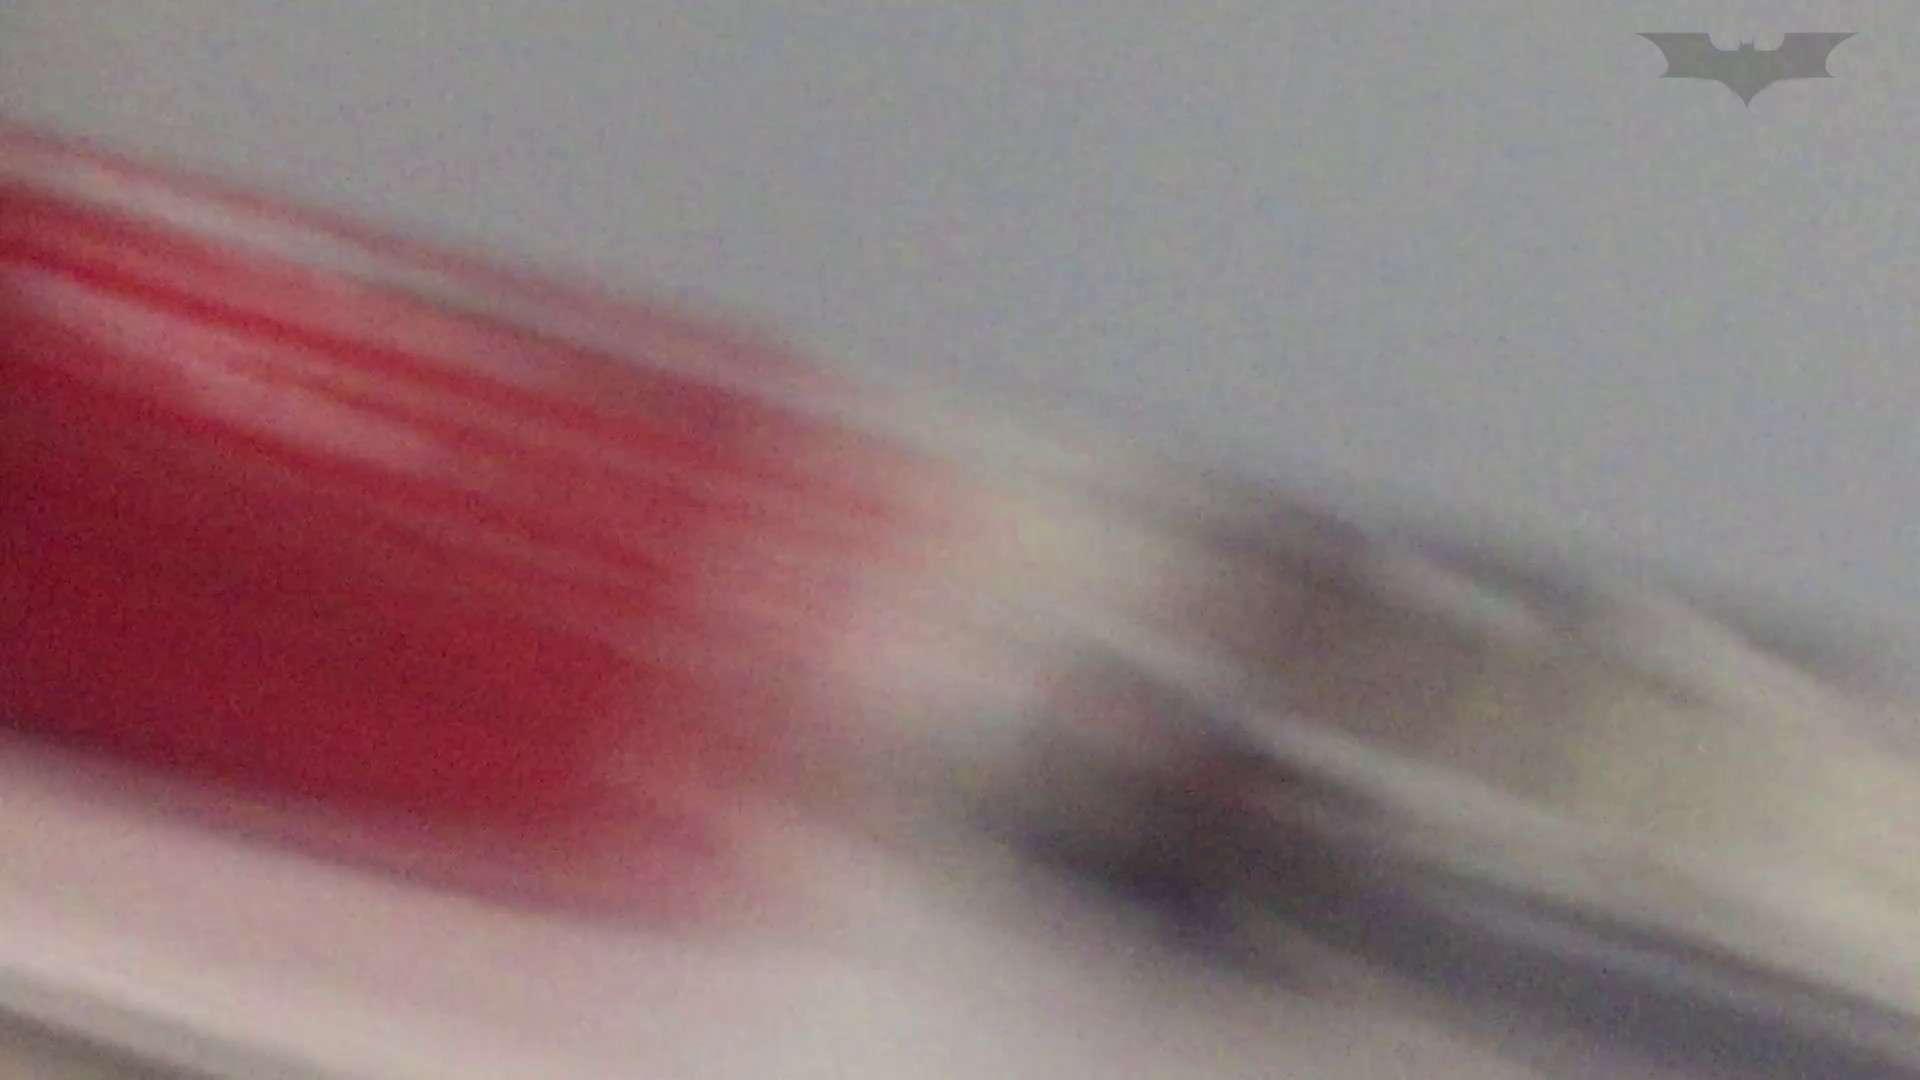 JD盗撮 美女の洗面所の秘密 Vol.70 美女達のヌード | 盗撮エロすぎ  20連発 6